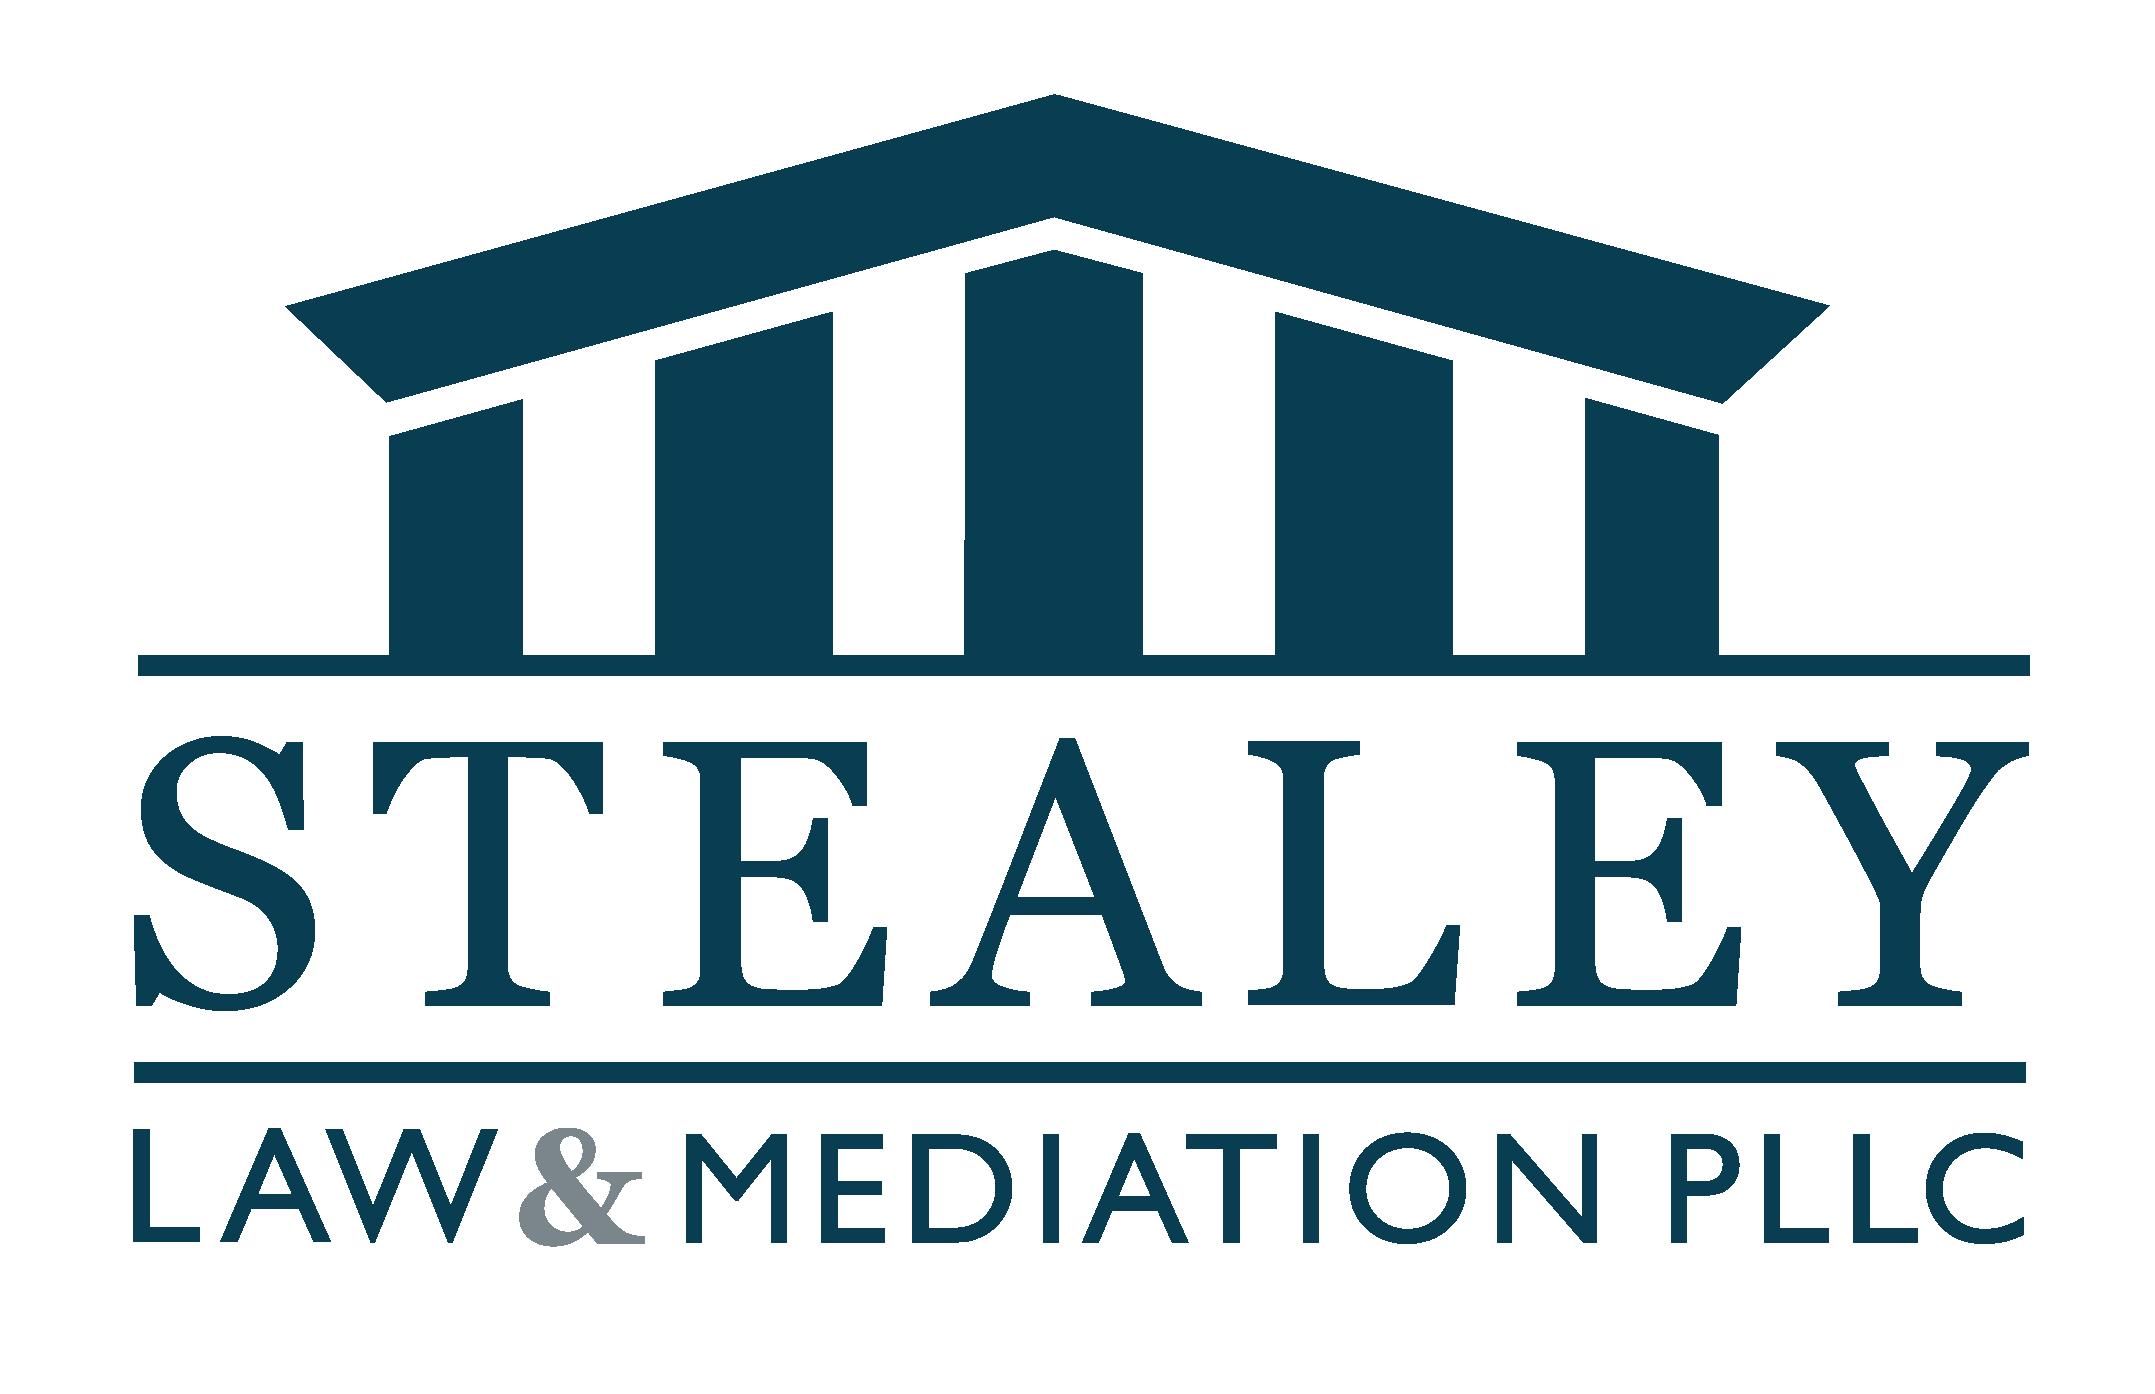 Stealey Law & Mediation